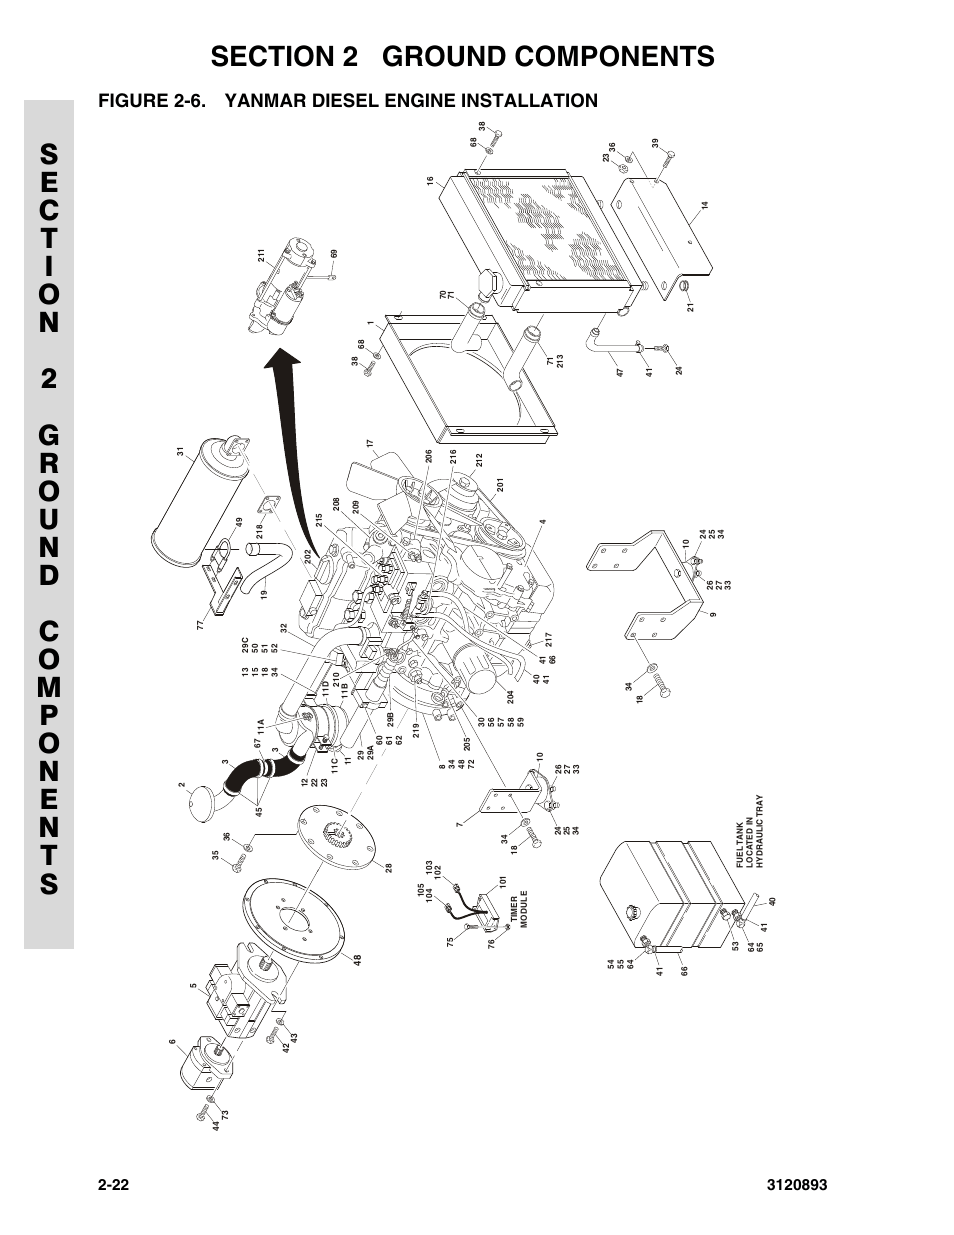 Figure 2-6. yanmar diesel engine installation, Yanmar